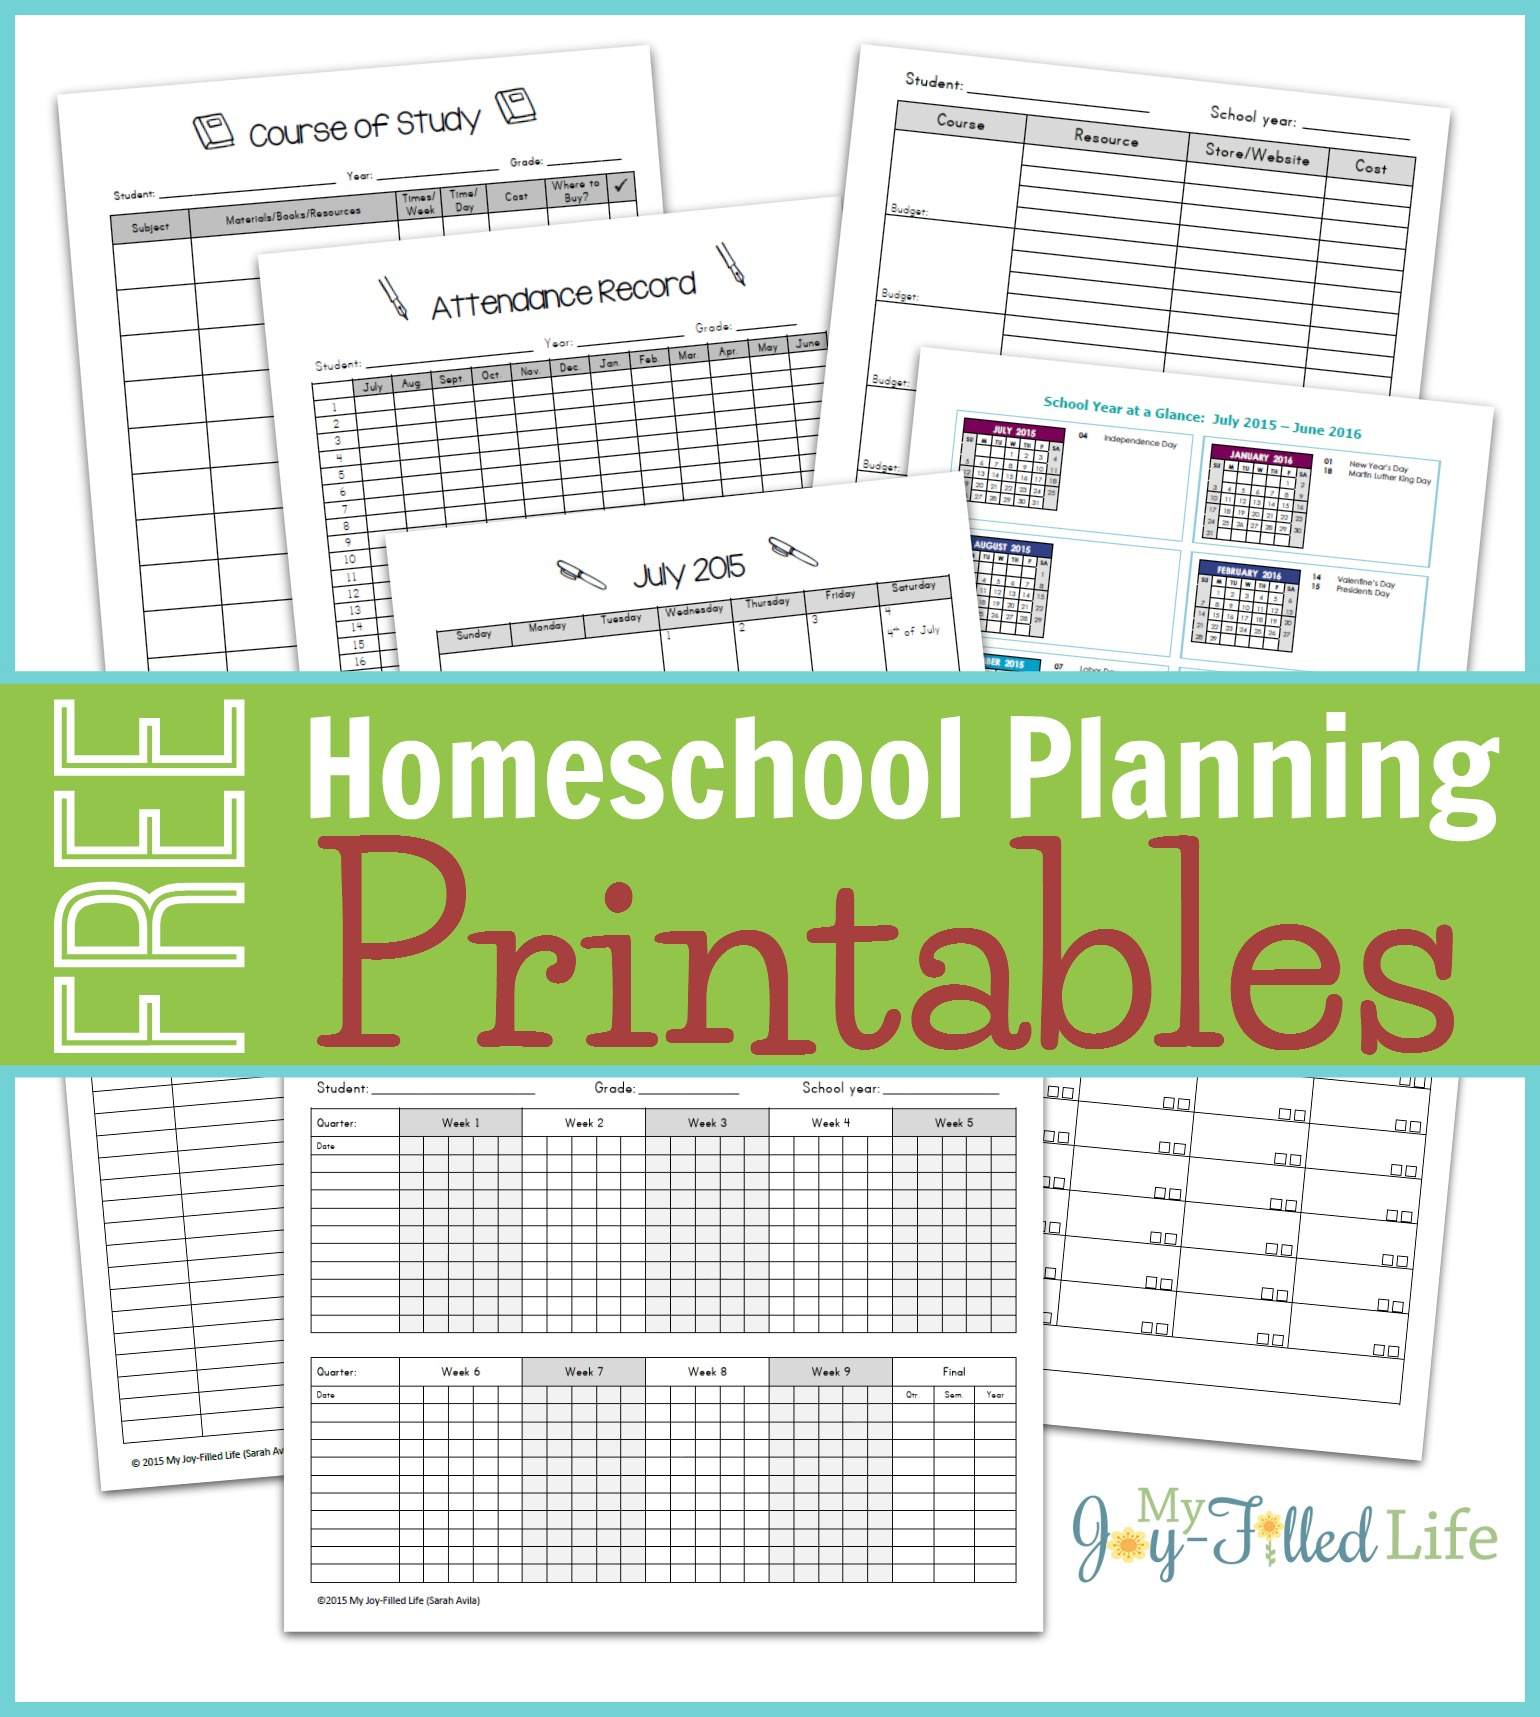 Homeschool Planning Resources & Free Printable Planning Pages - My - Free Printable Homeschool Curriculum